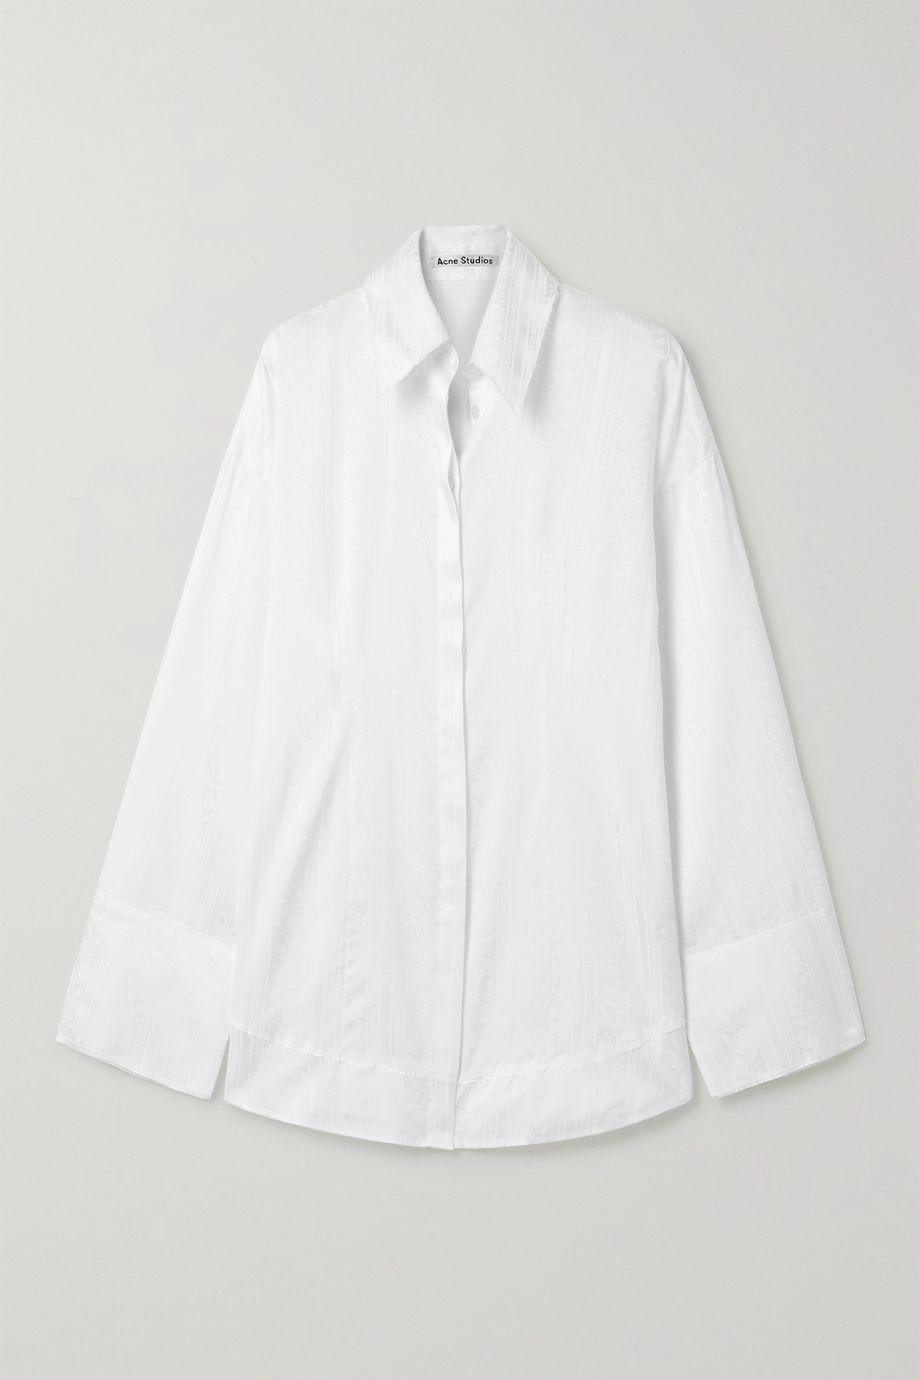 Acne Studios Oversized satin-jacquard shirt